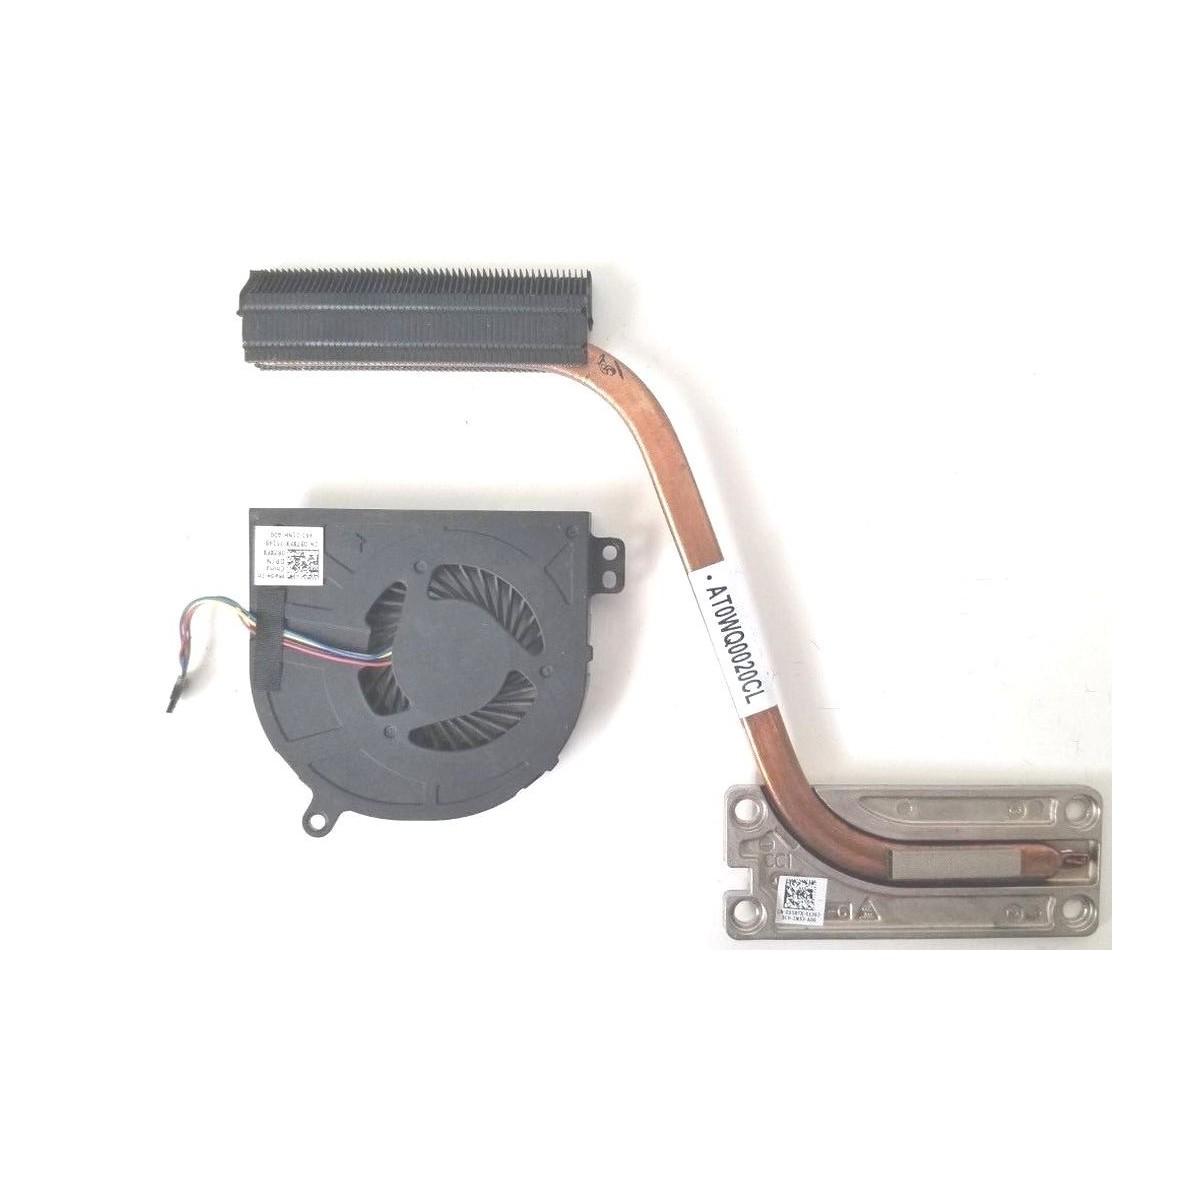 CONTROL PROCESOR CISCO CATALYST 4500 WS-X4516-10GE